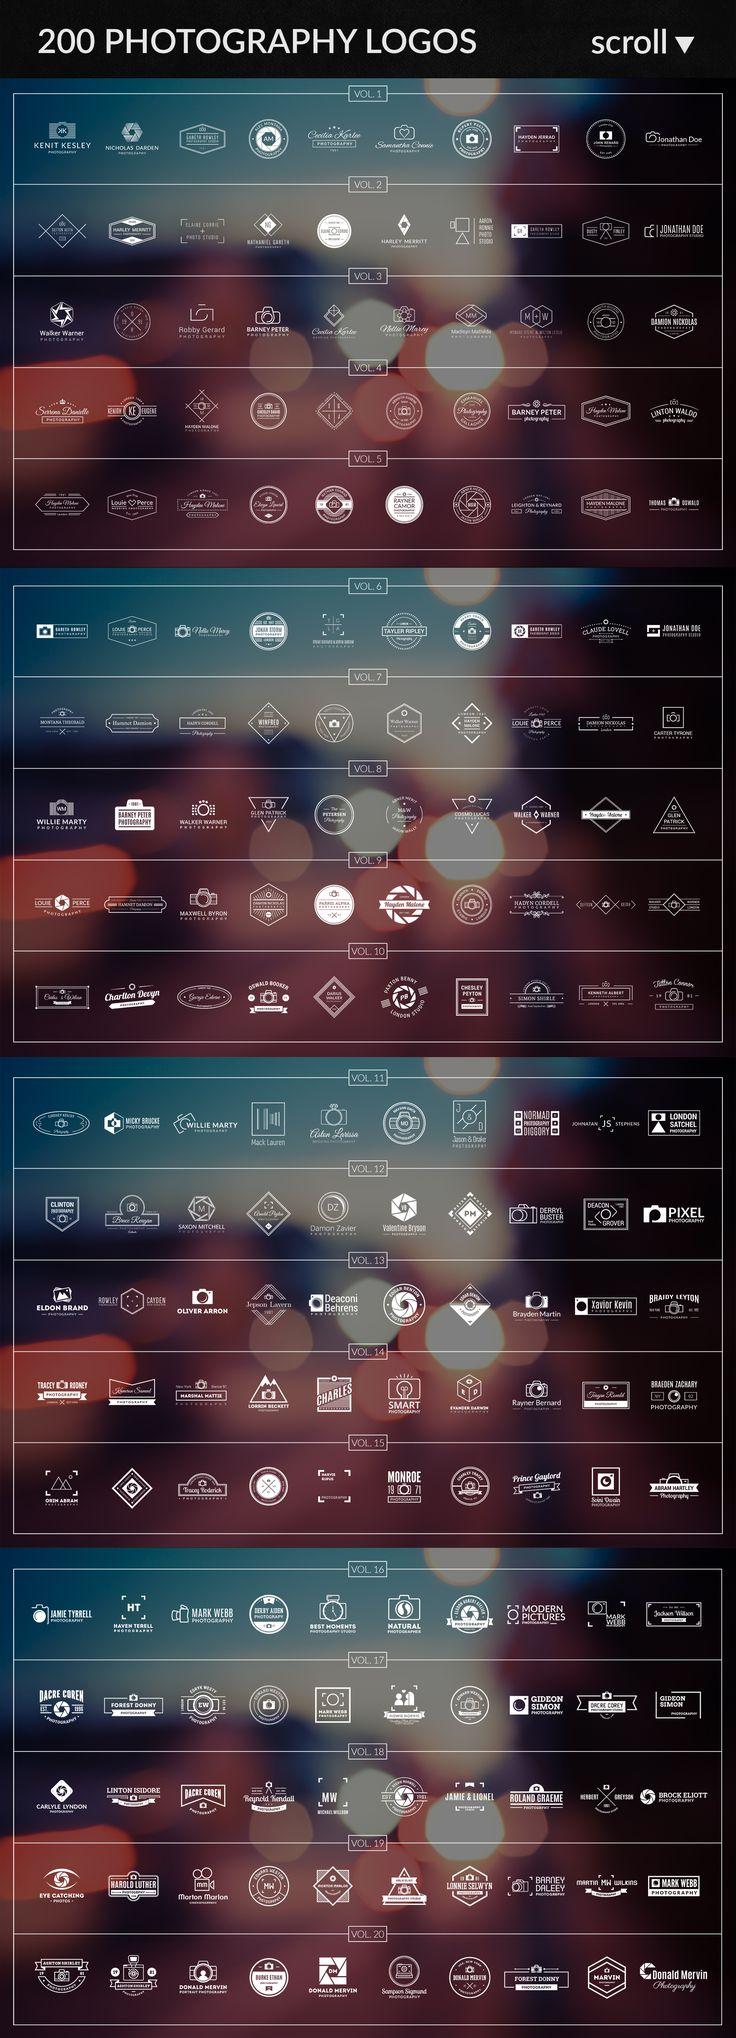 800 Logos & Badges SALE by Piotr Łapa Atelier on Creative Market